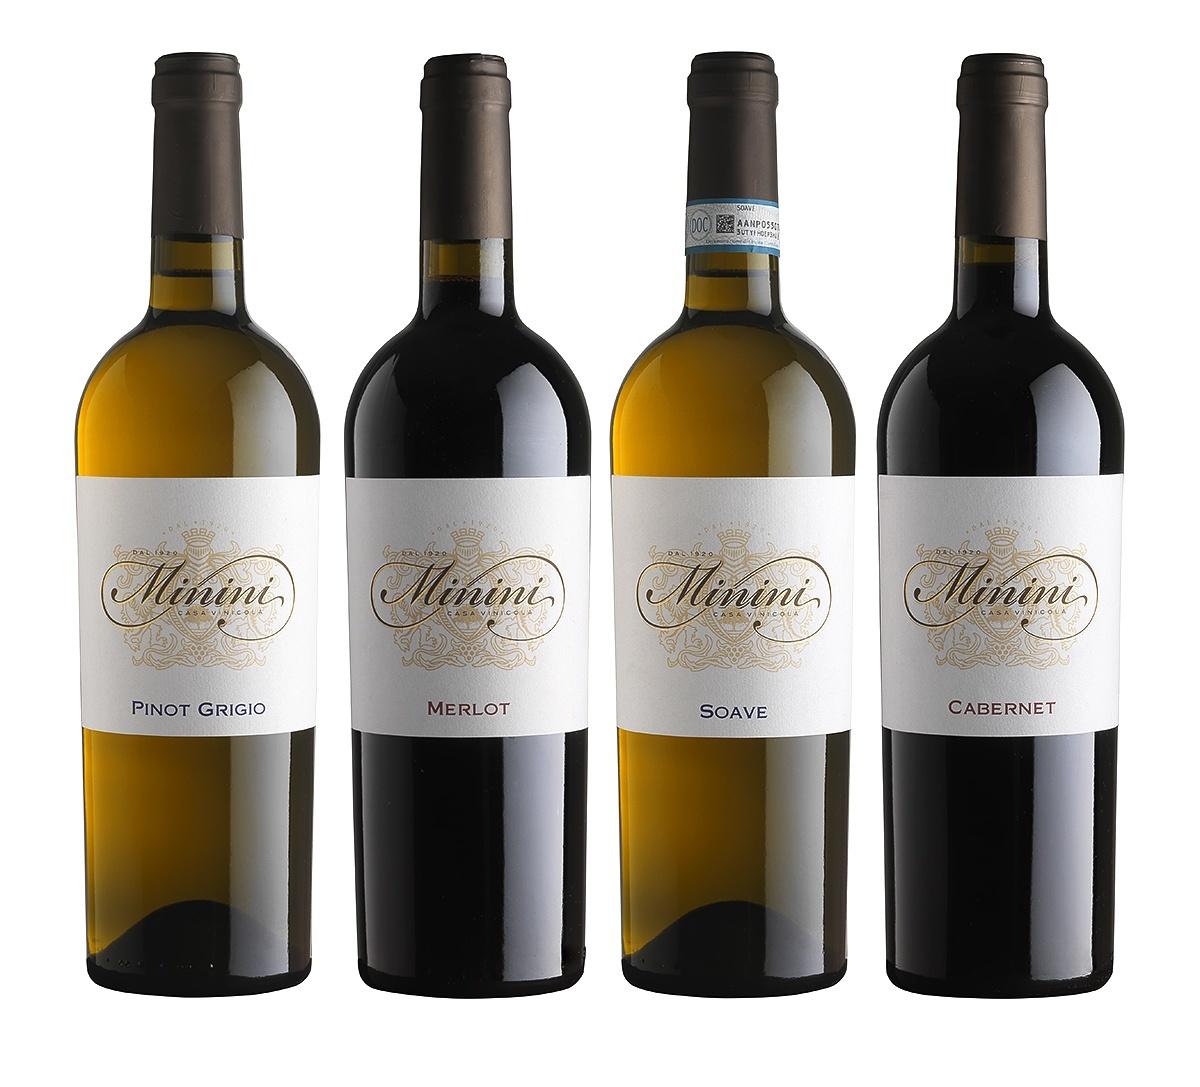 Minini wine label u2013 the spirit of Tuscany